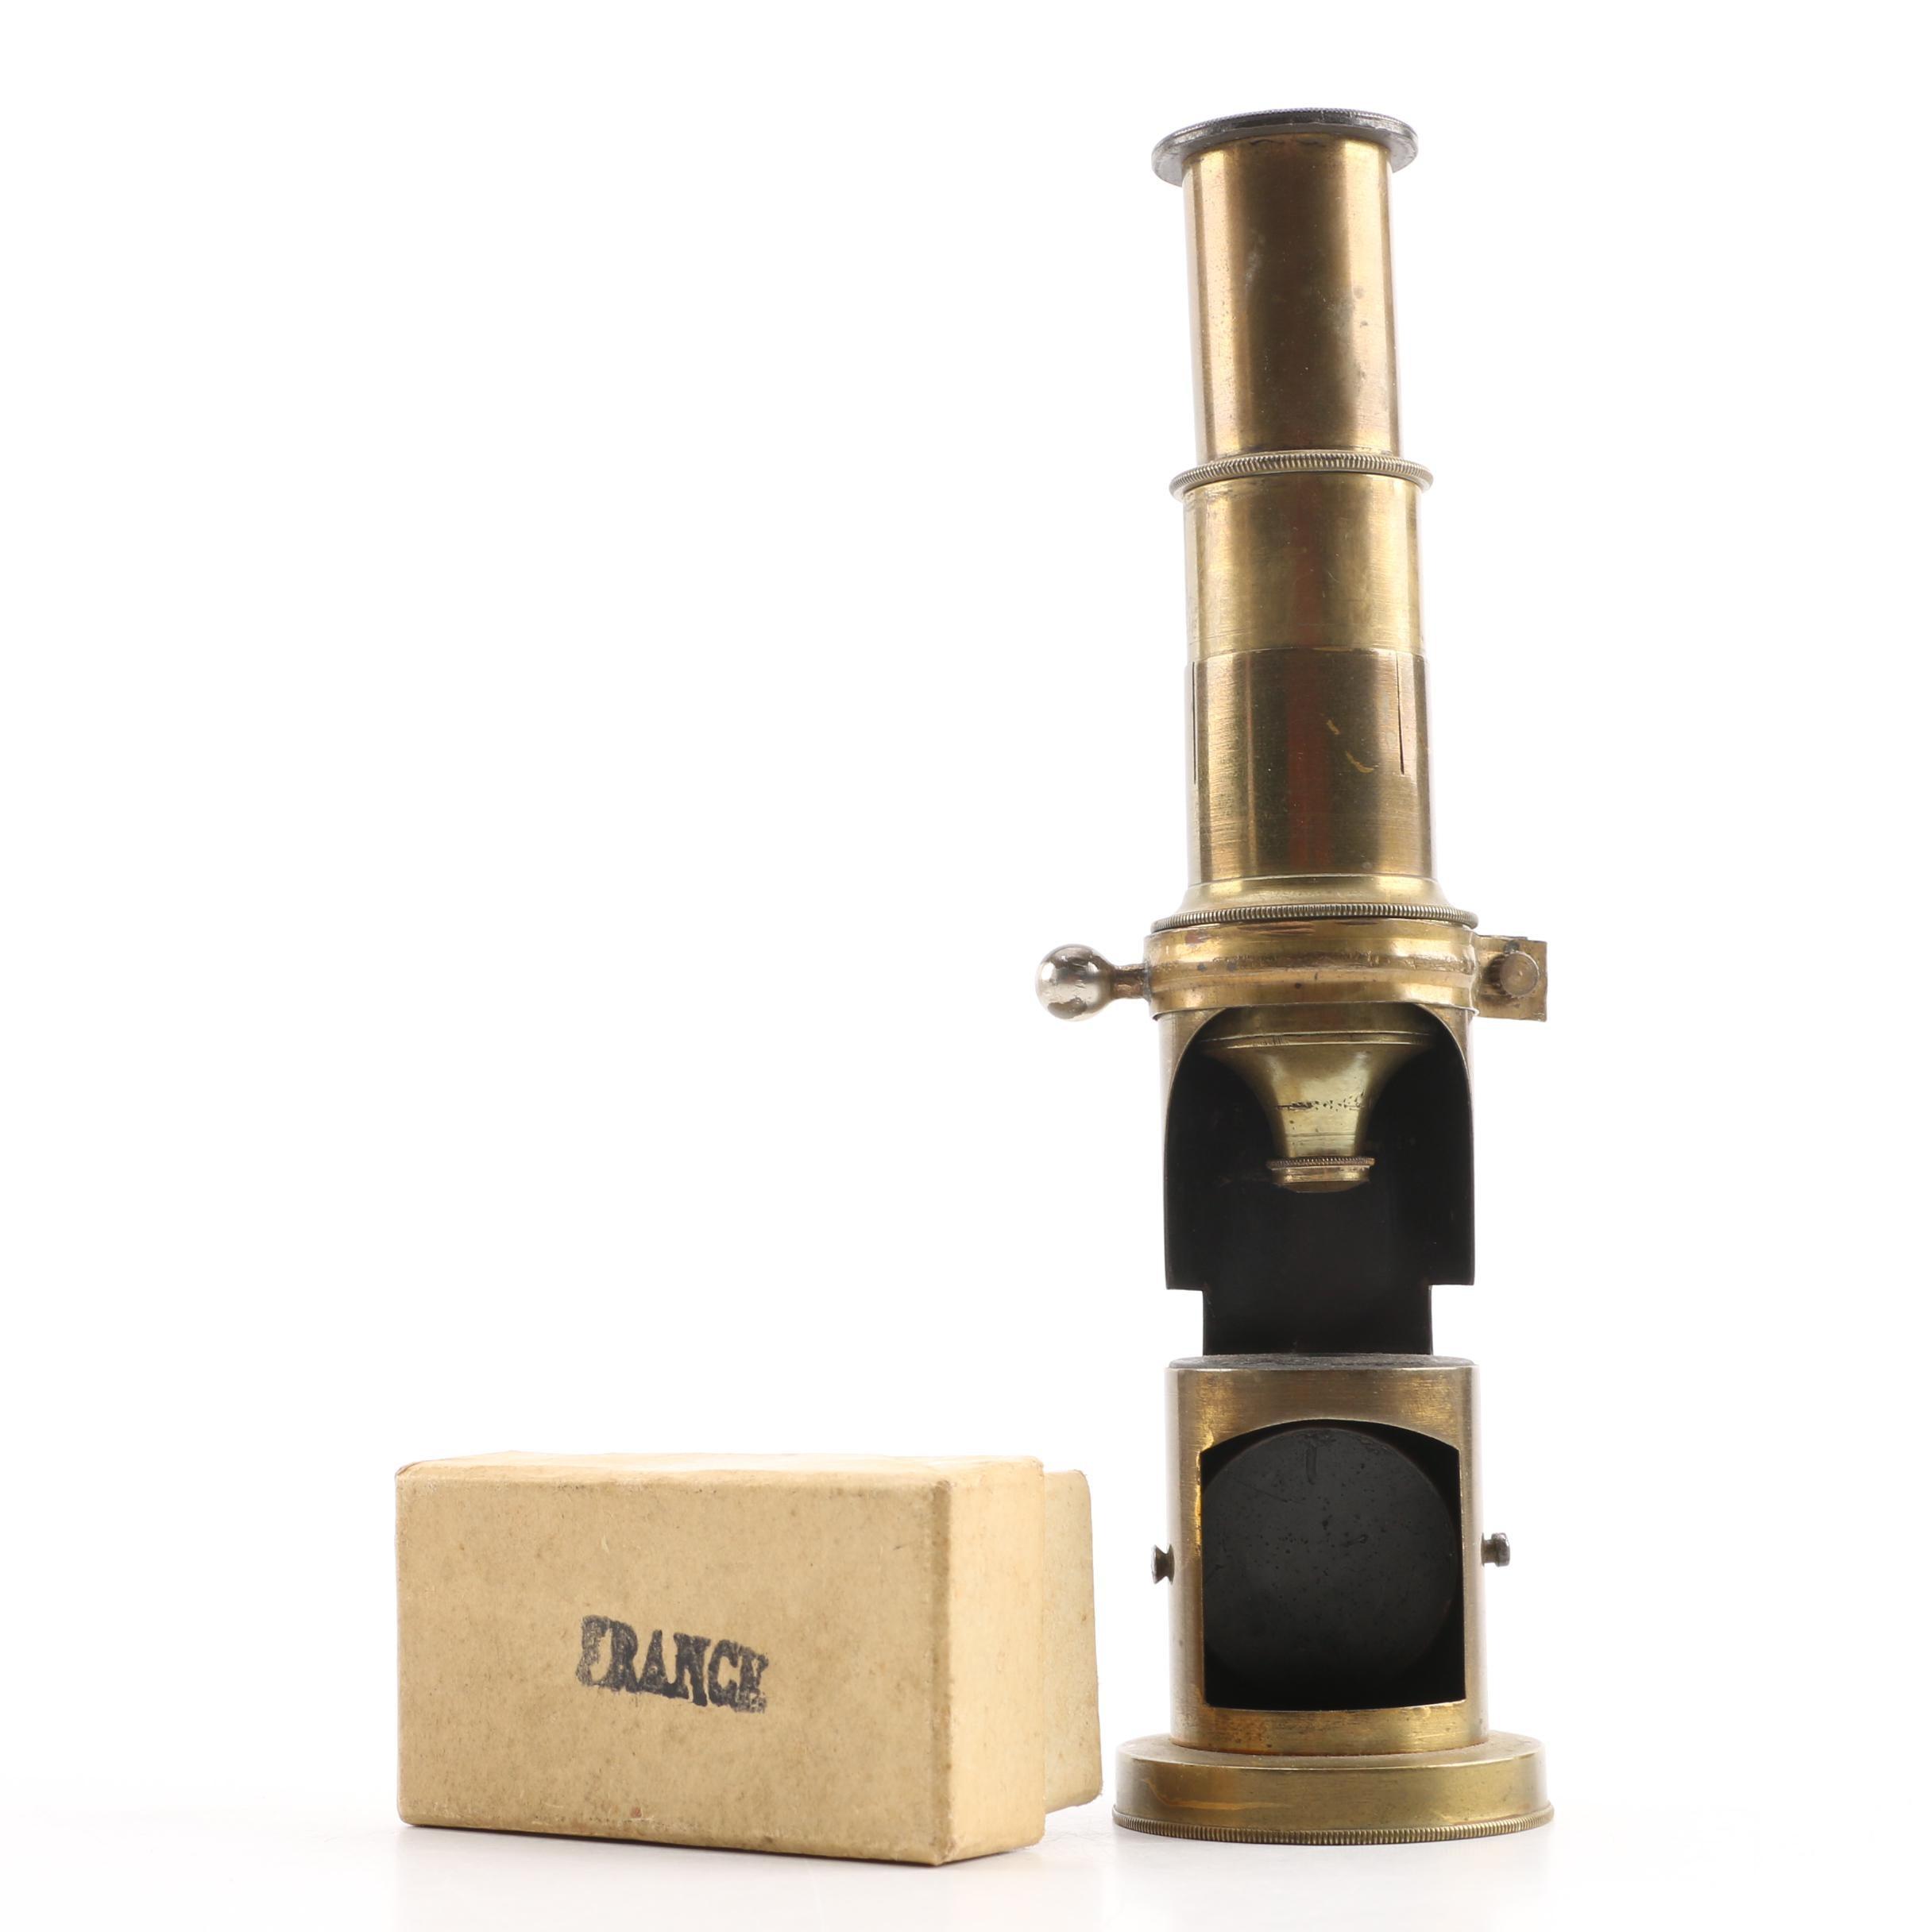 Antique Brass Microscope Barrels